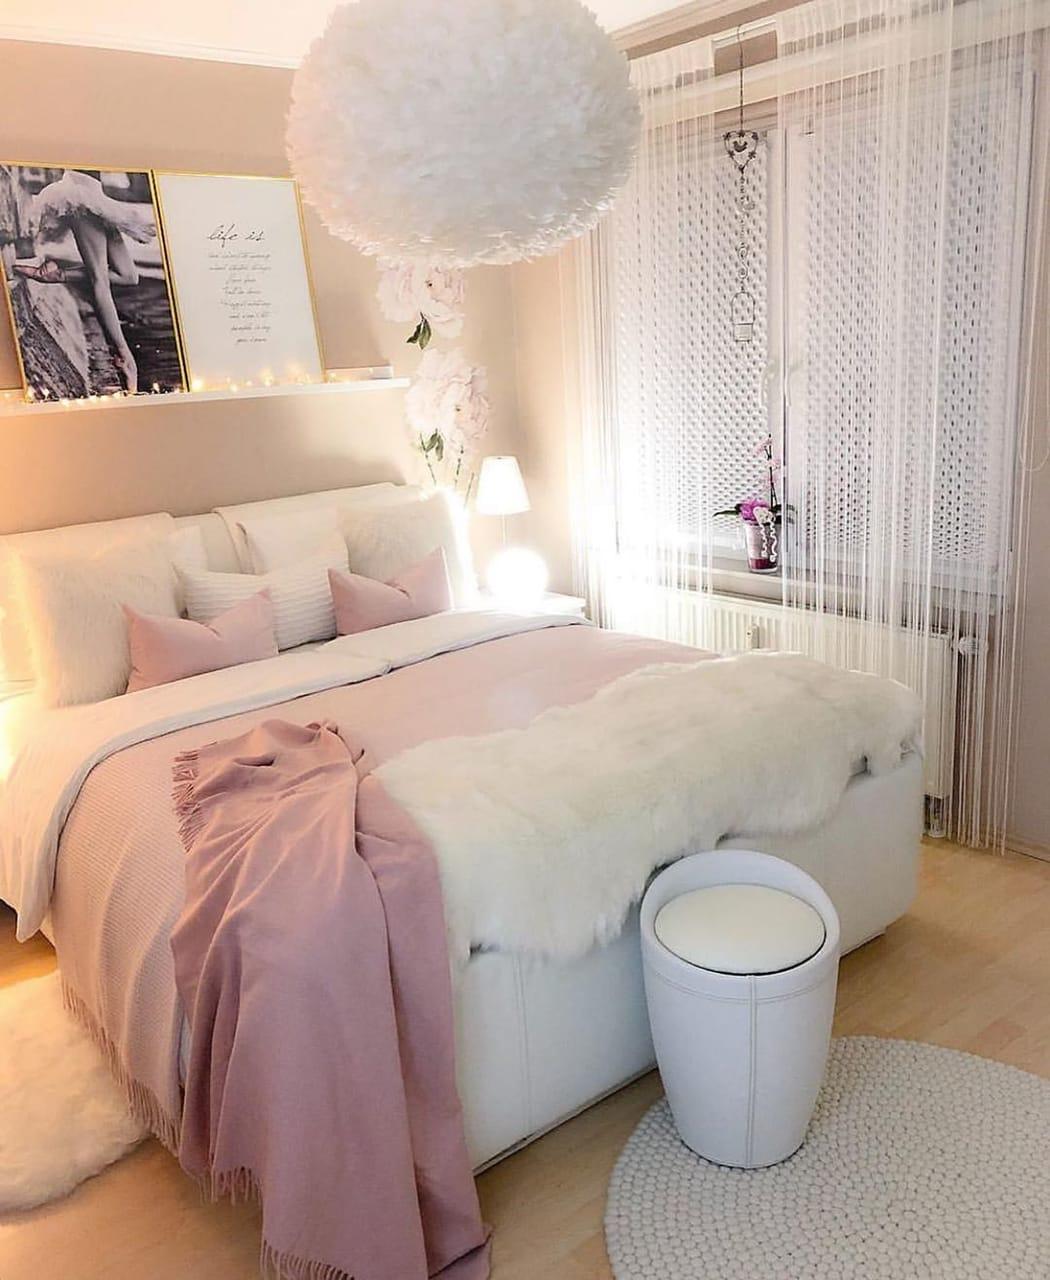 "Room For Girl Interior Inspo on Instagram: ""Beautiful bedroom"